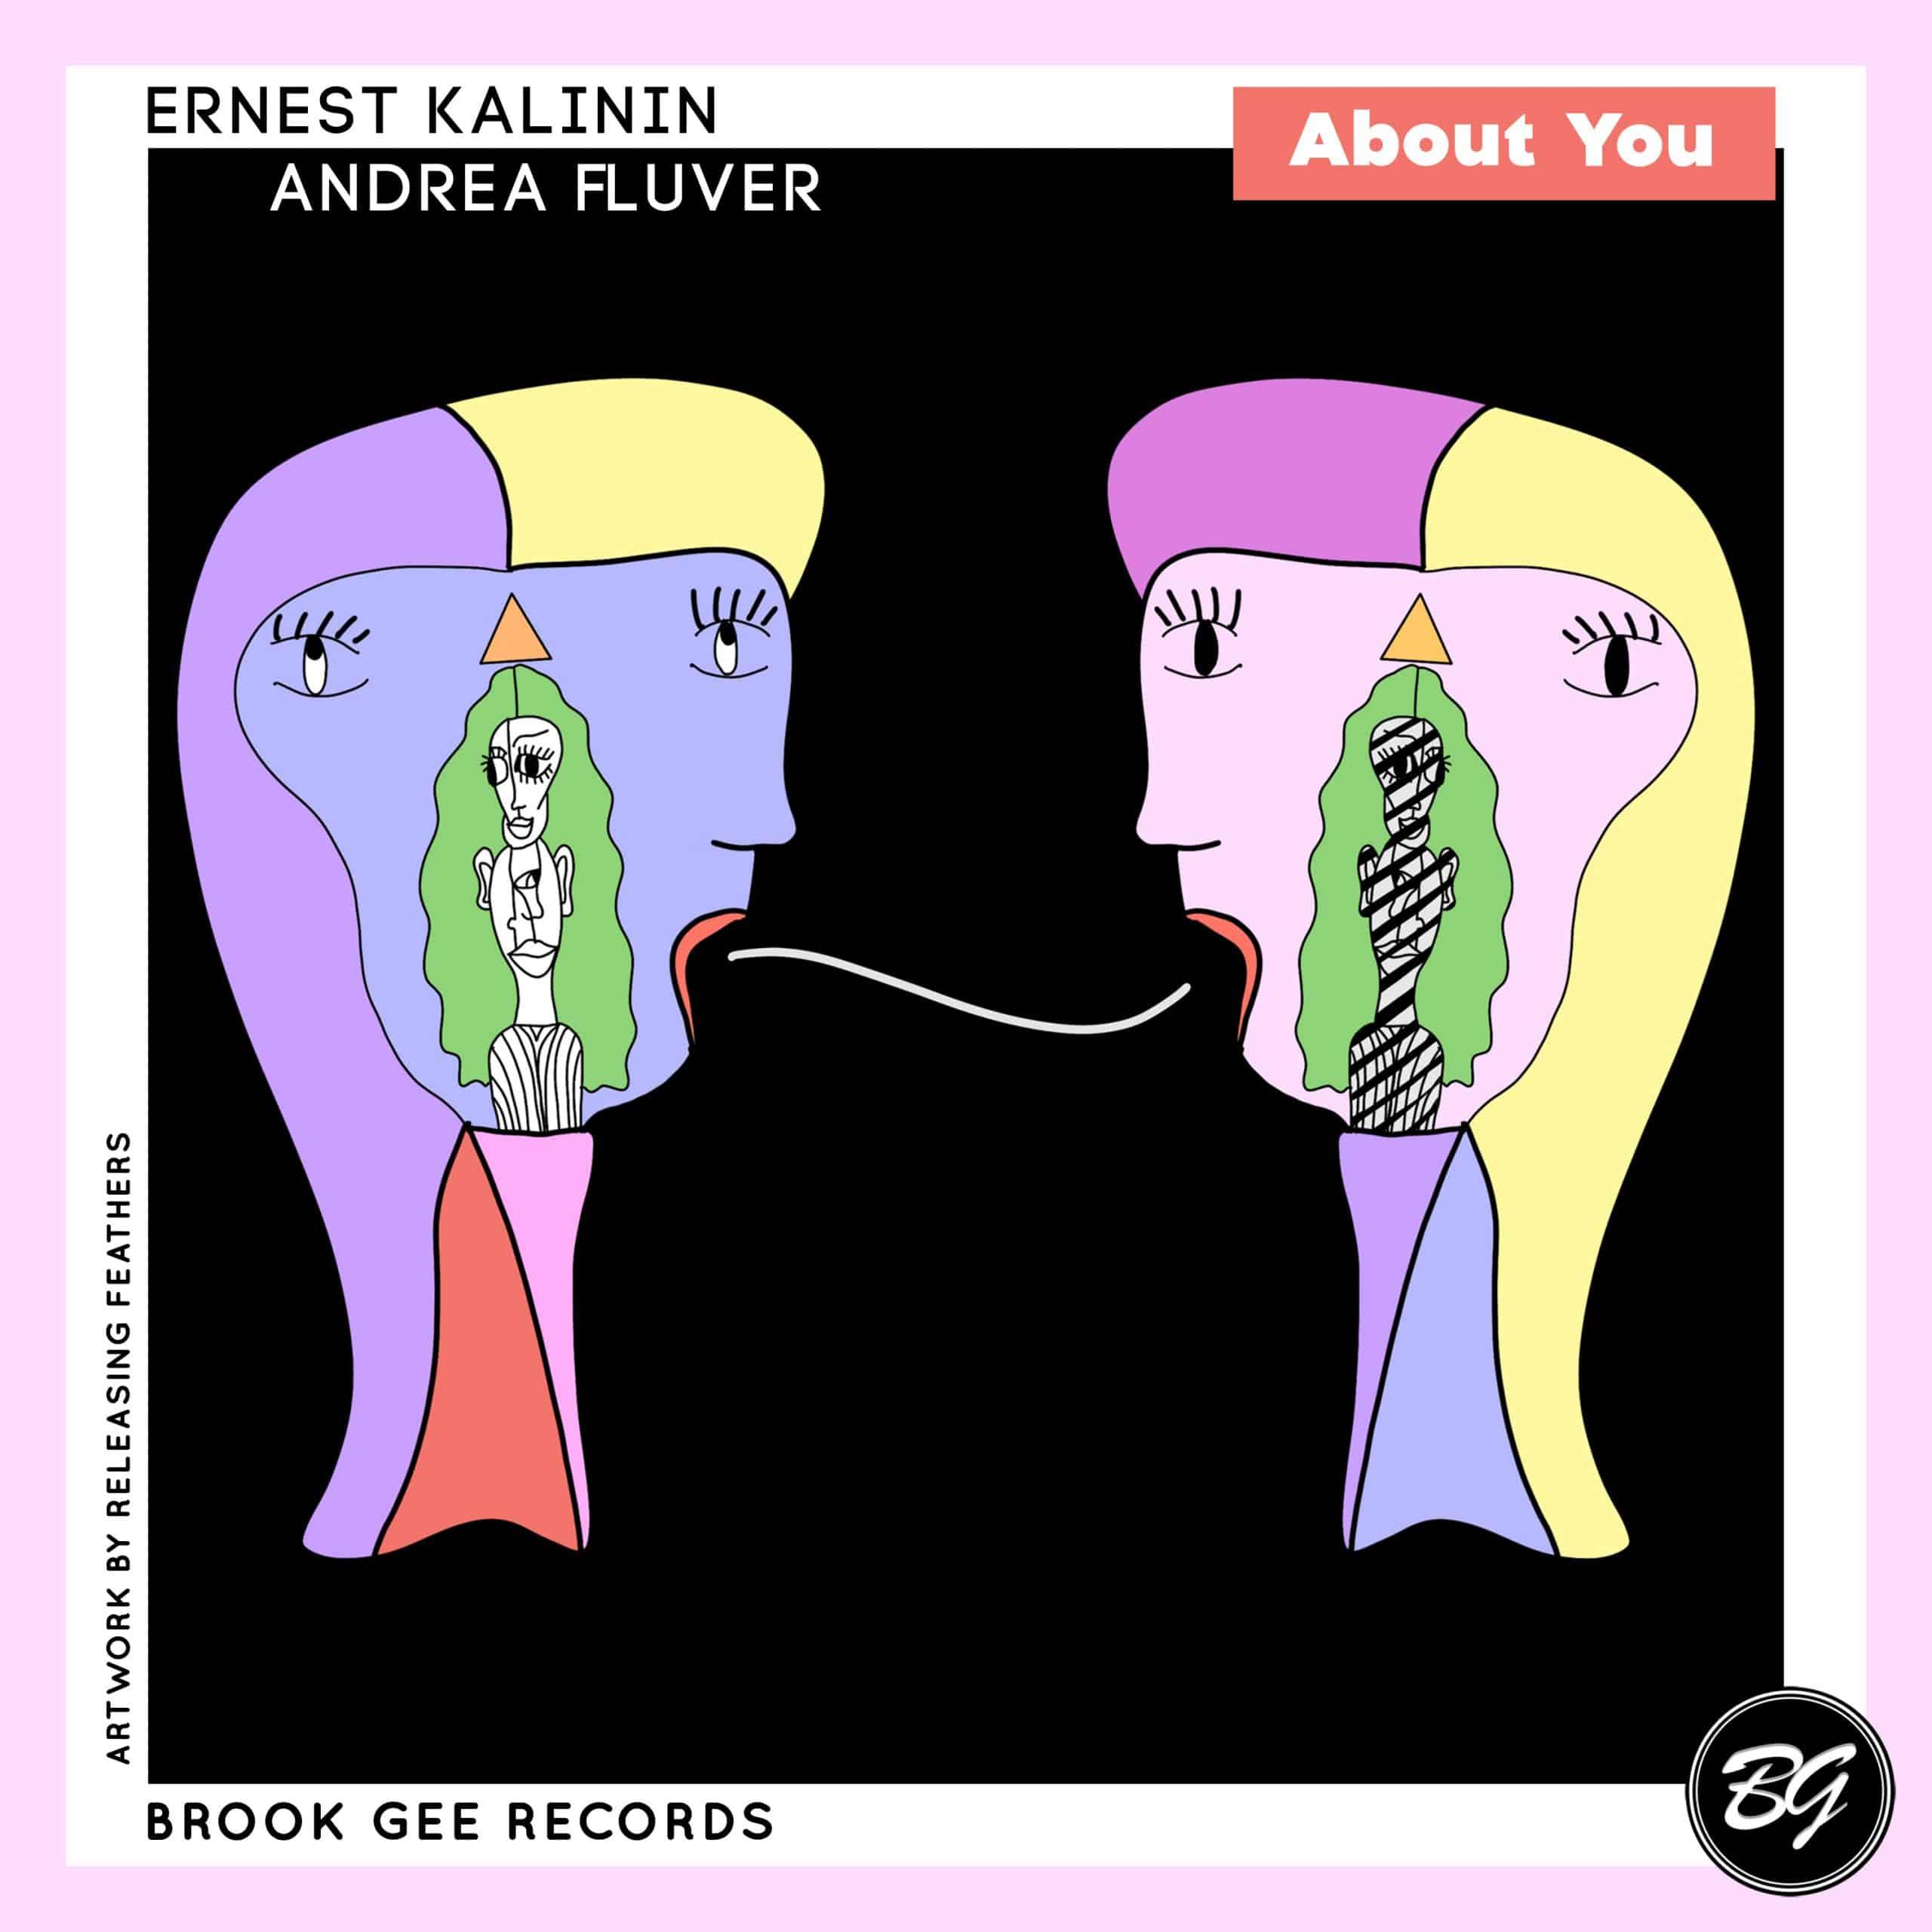 Ernest Kalinin - About_You_Artwork_2